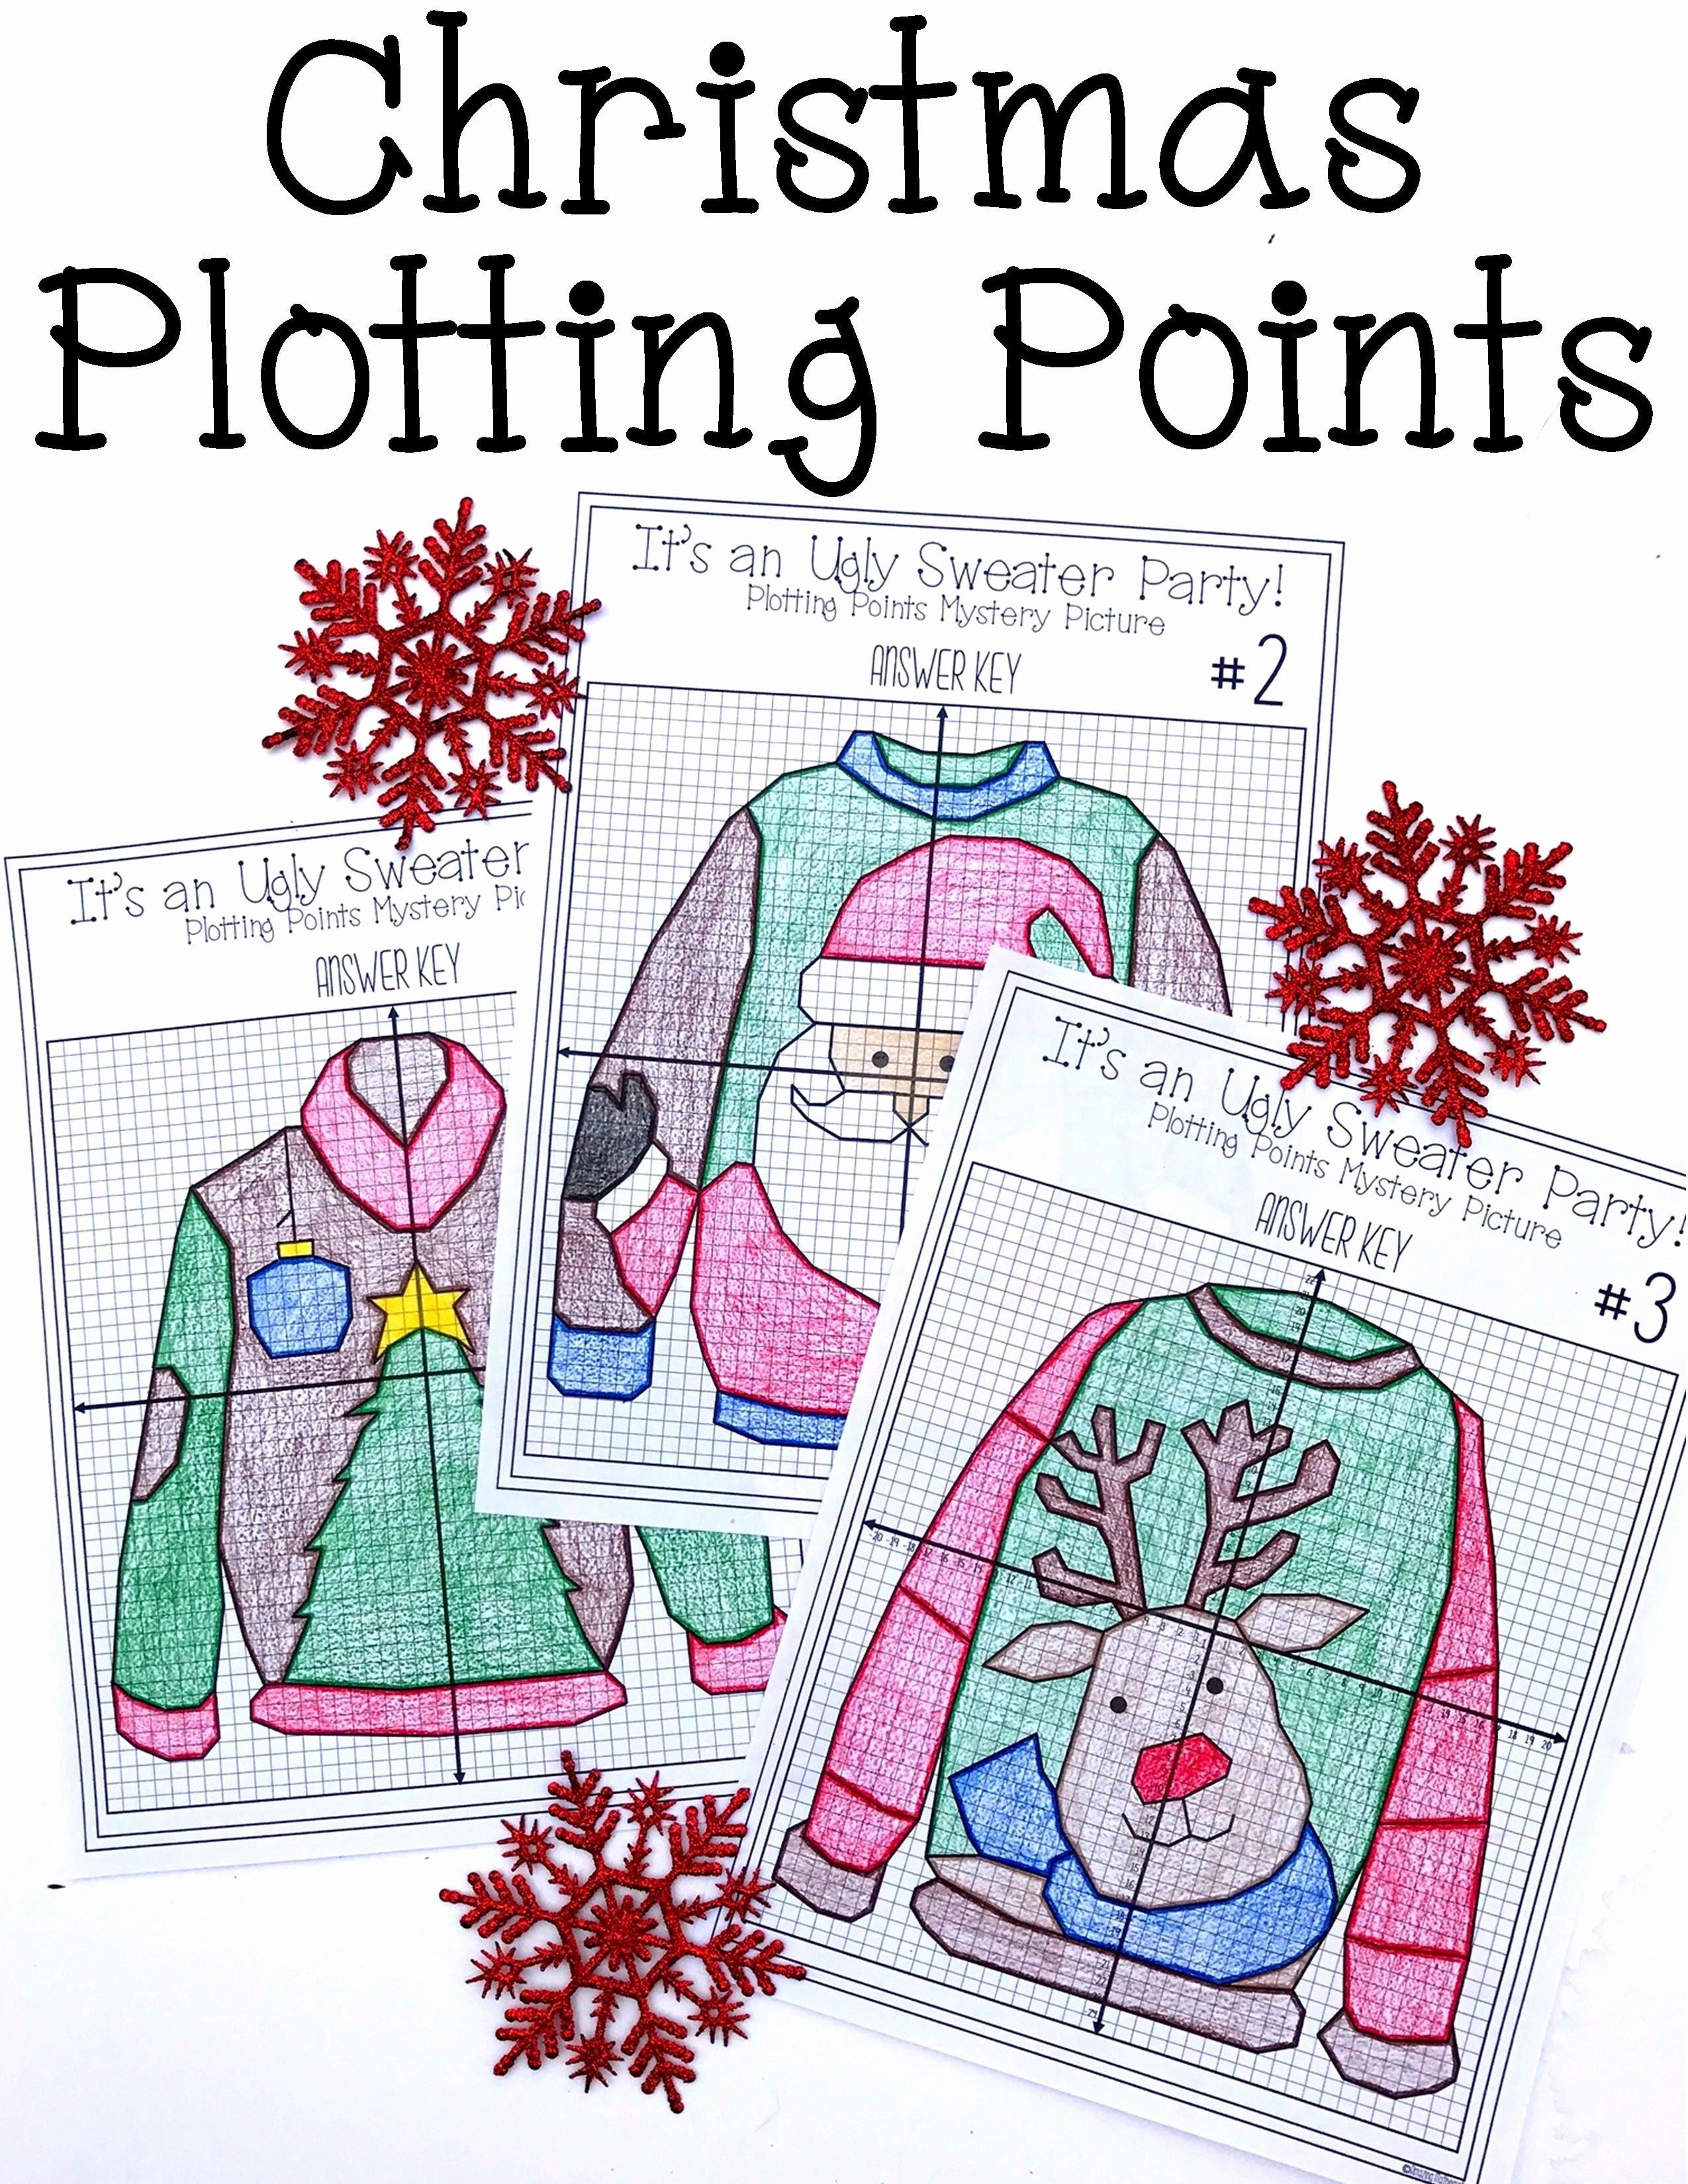 Plotting Points Worksheet Pdf New Christmas Math Activity Ugly Sweaters Plotting Points